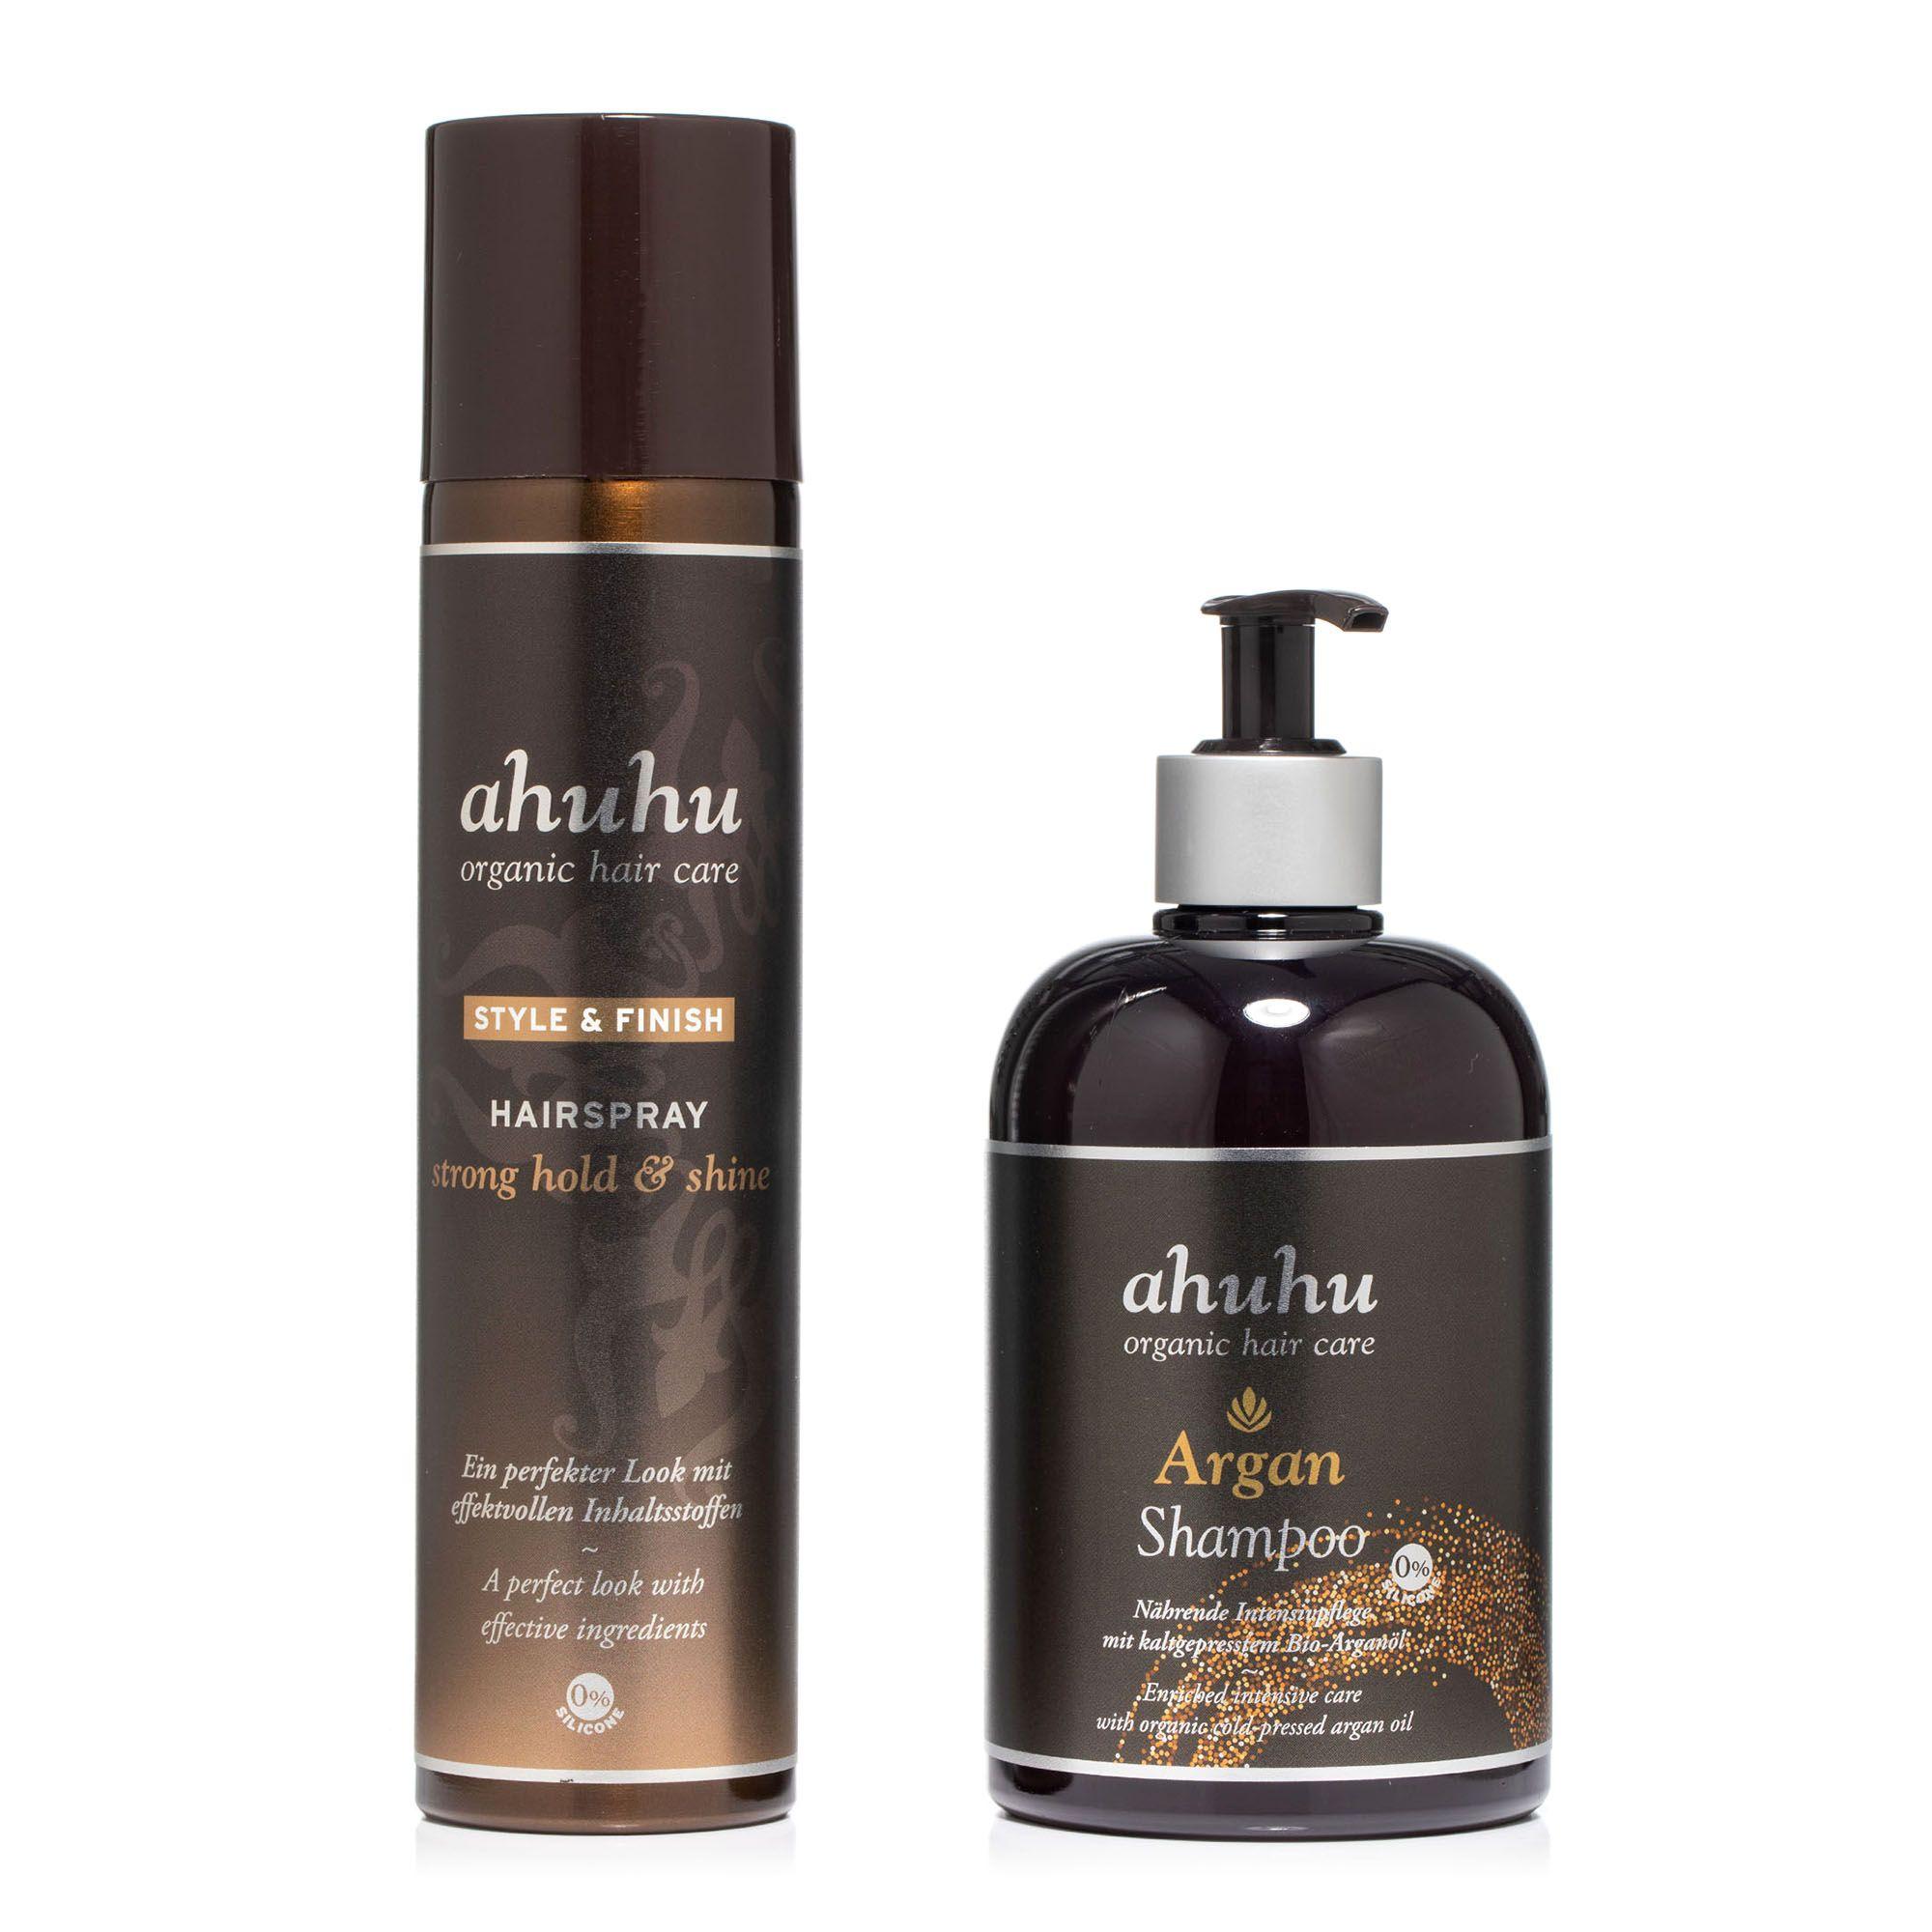 ahuhu organic hair care Argan Shampoo 500ml Hairspray strong hold & shine 300ml